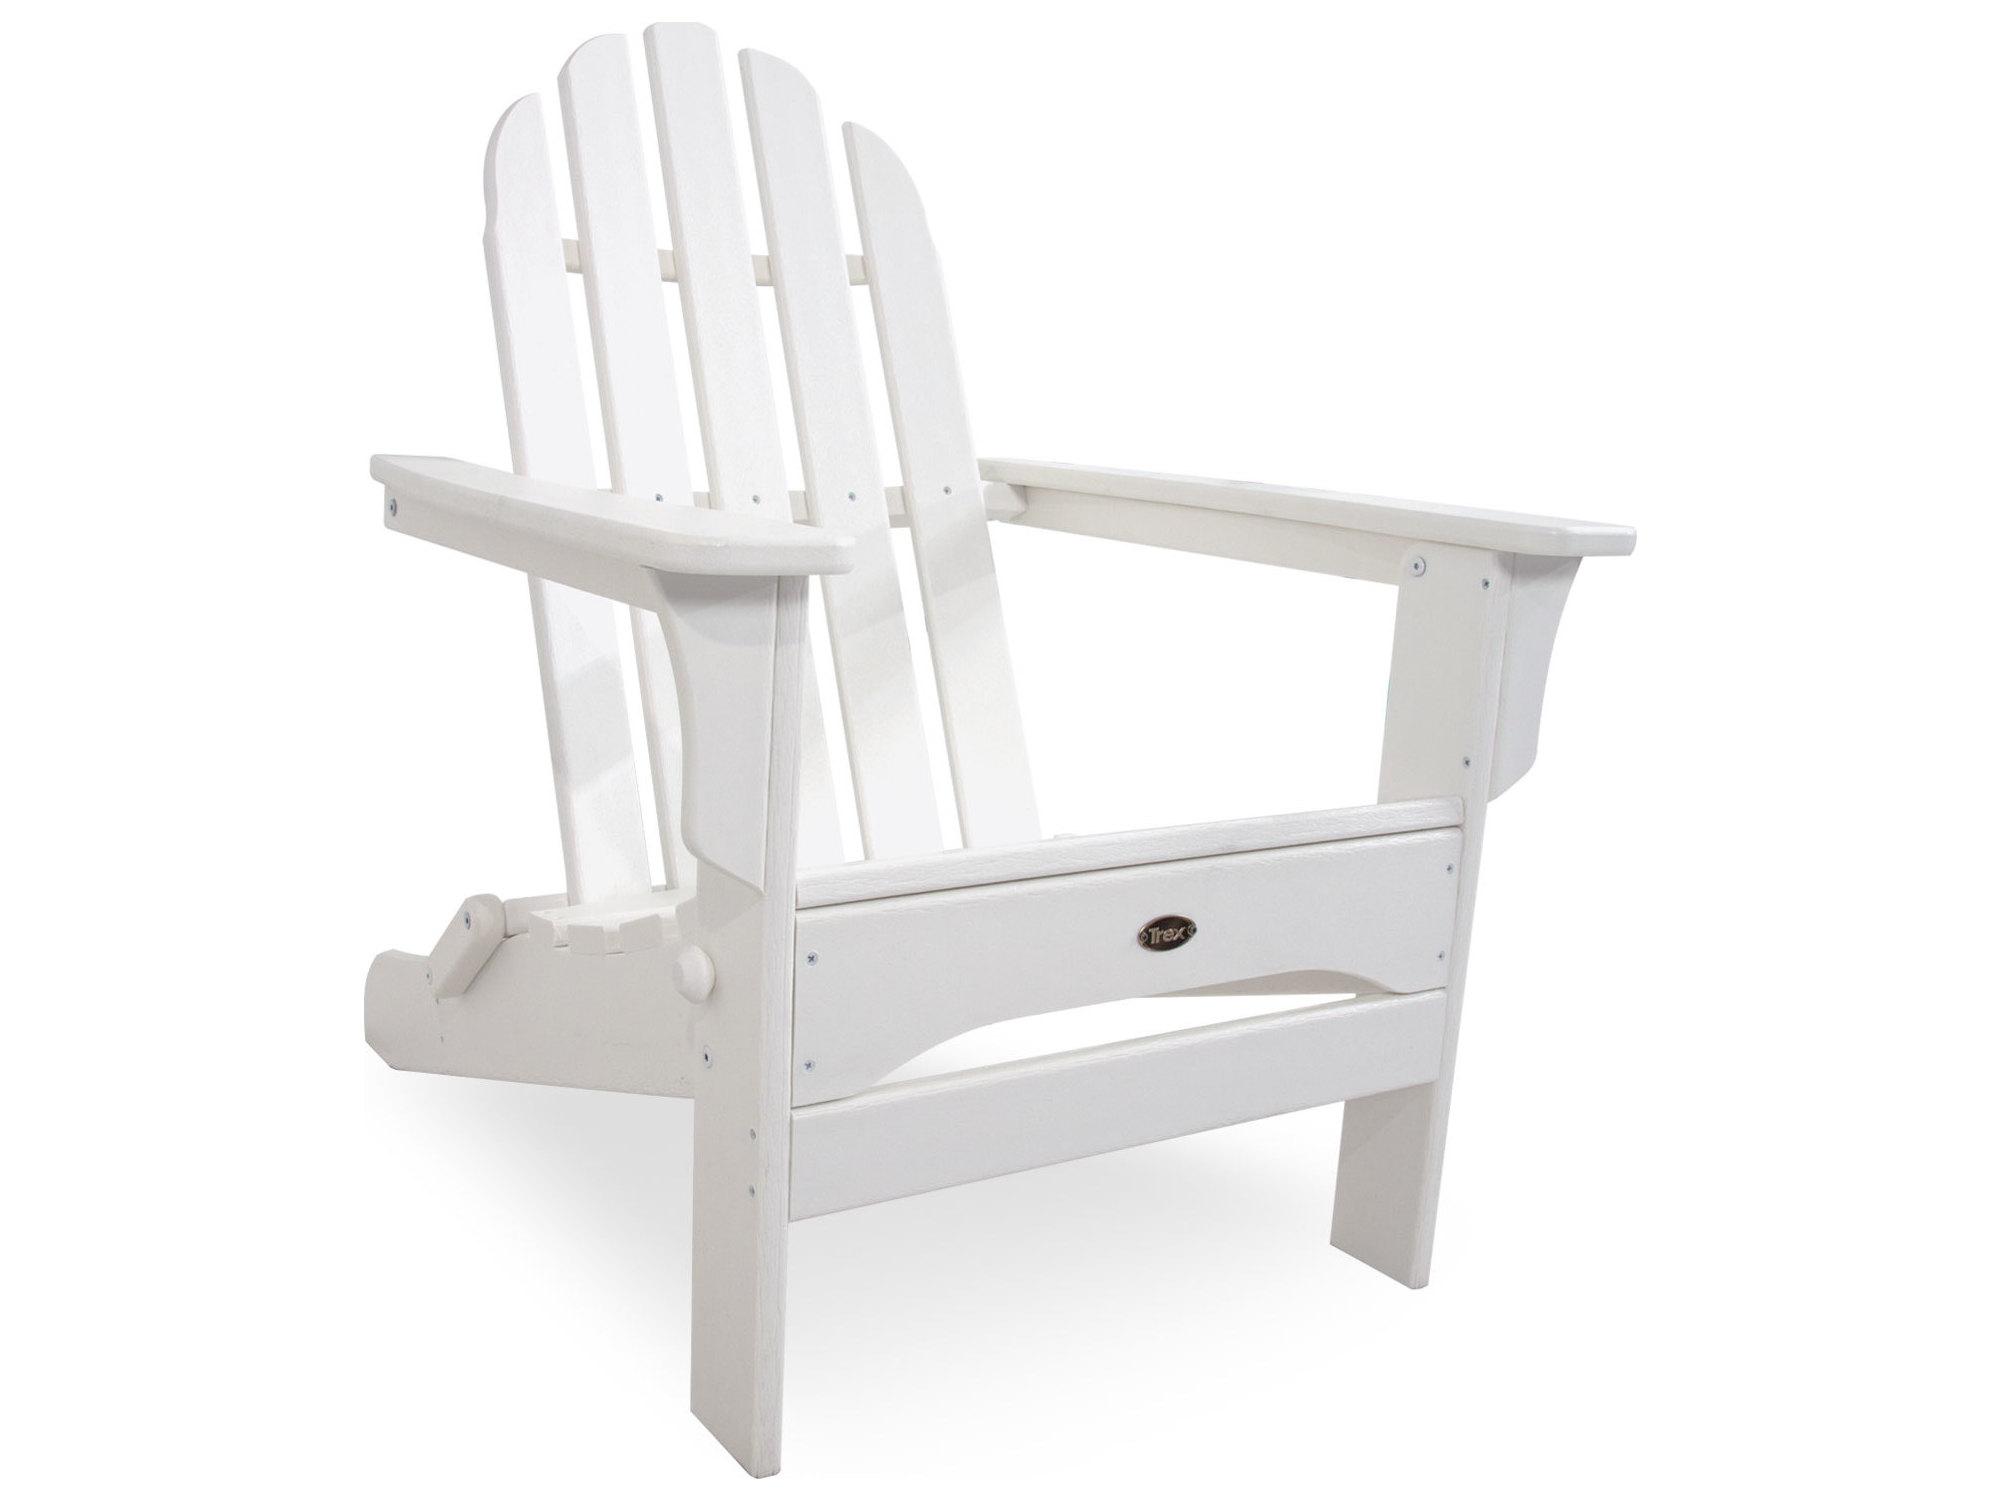 Trex 174 Outdoor Furniture Cape Cod Folding Adirondack In